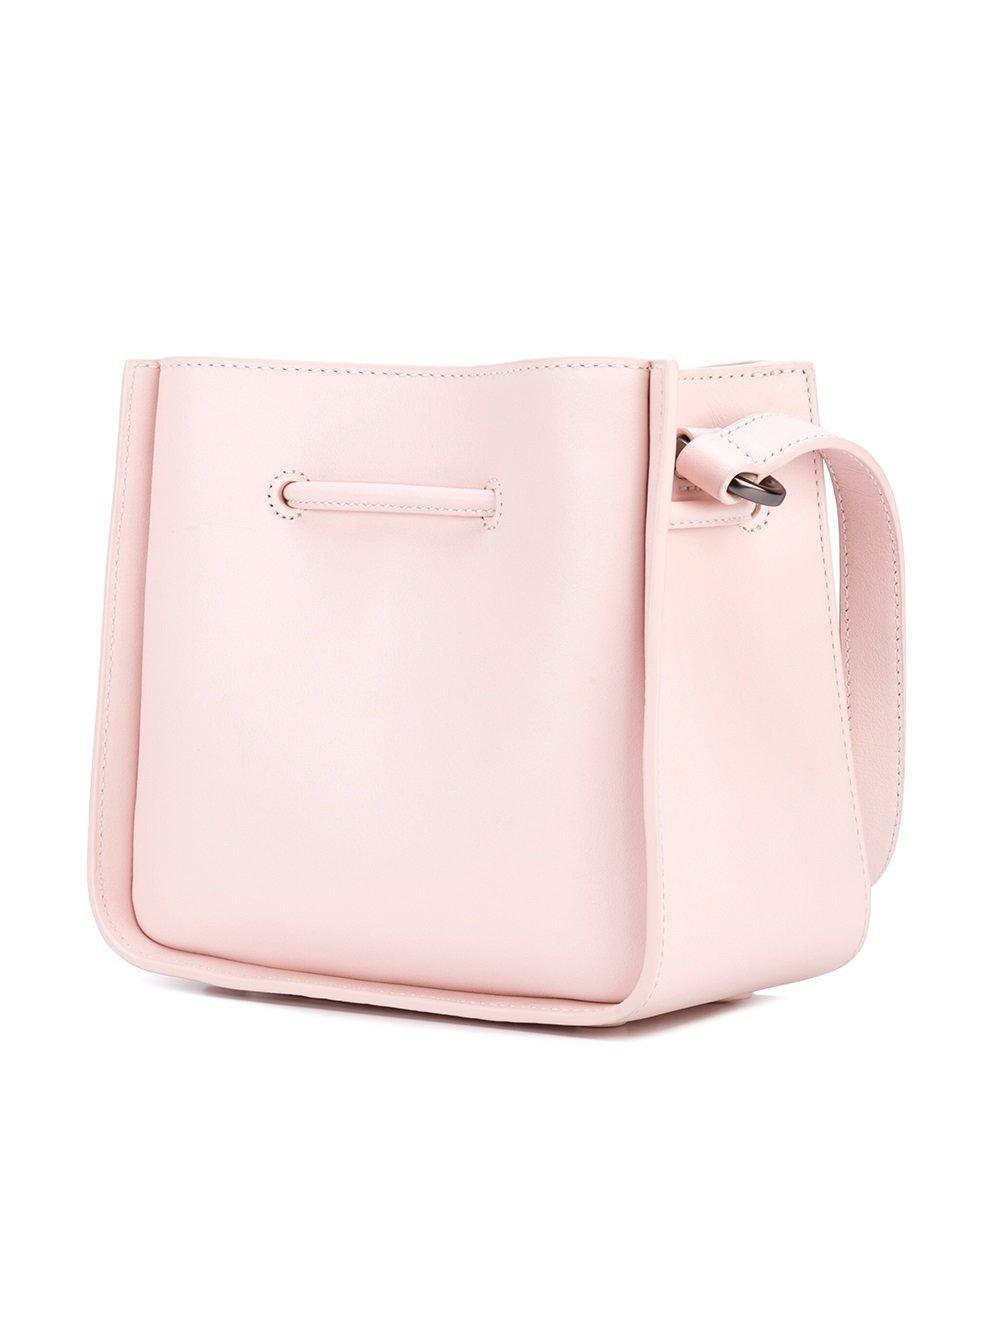 3.1 Phillip Lim Leather Mini Soleil Crossbody Bag in Pink & Purple (Pink)